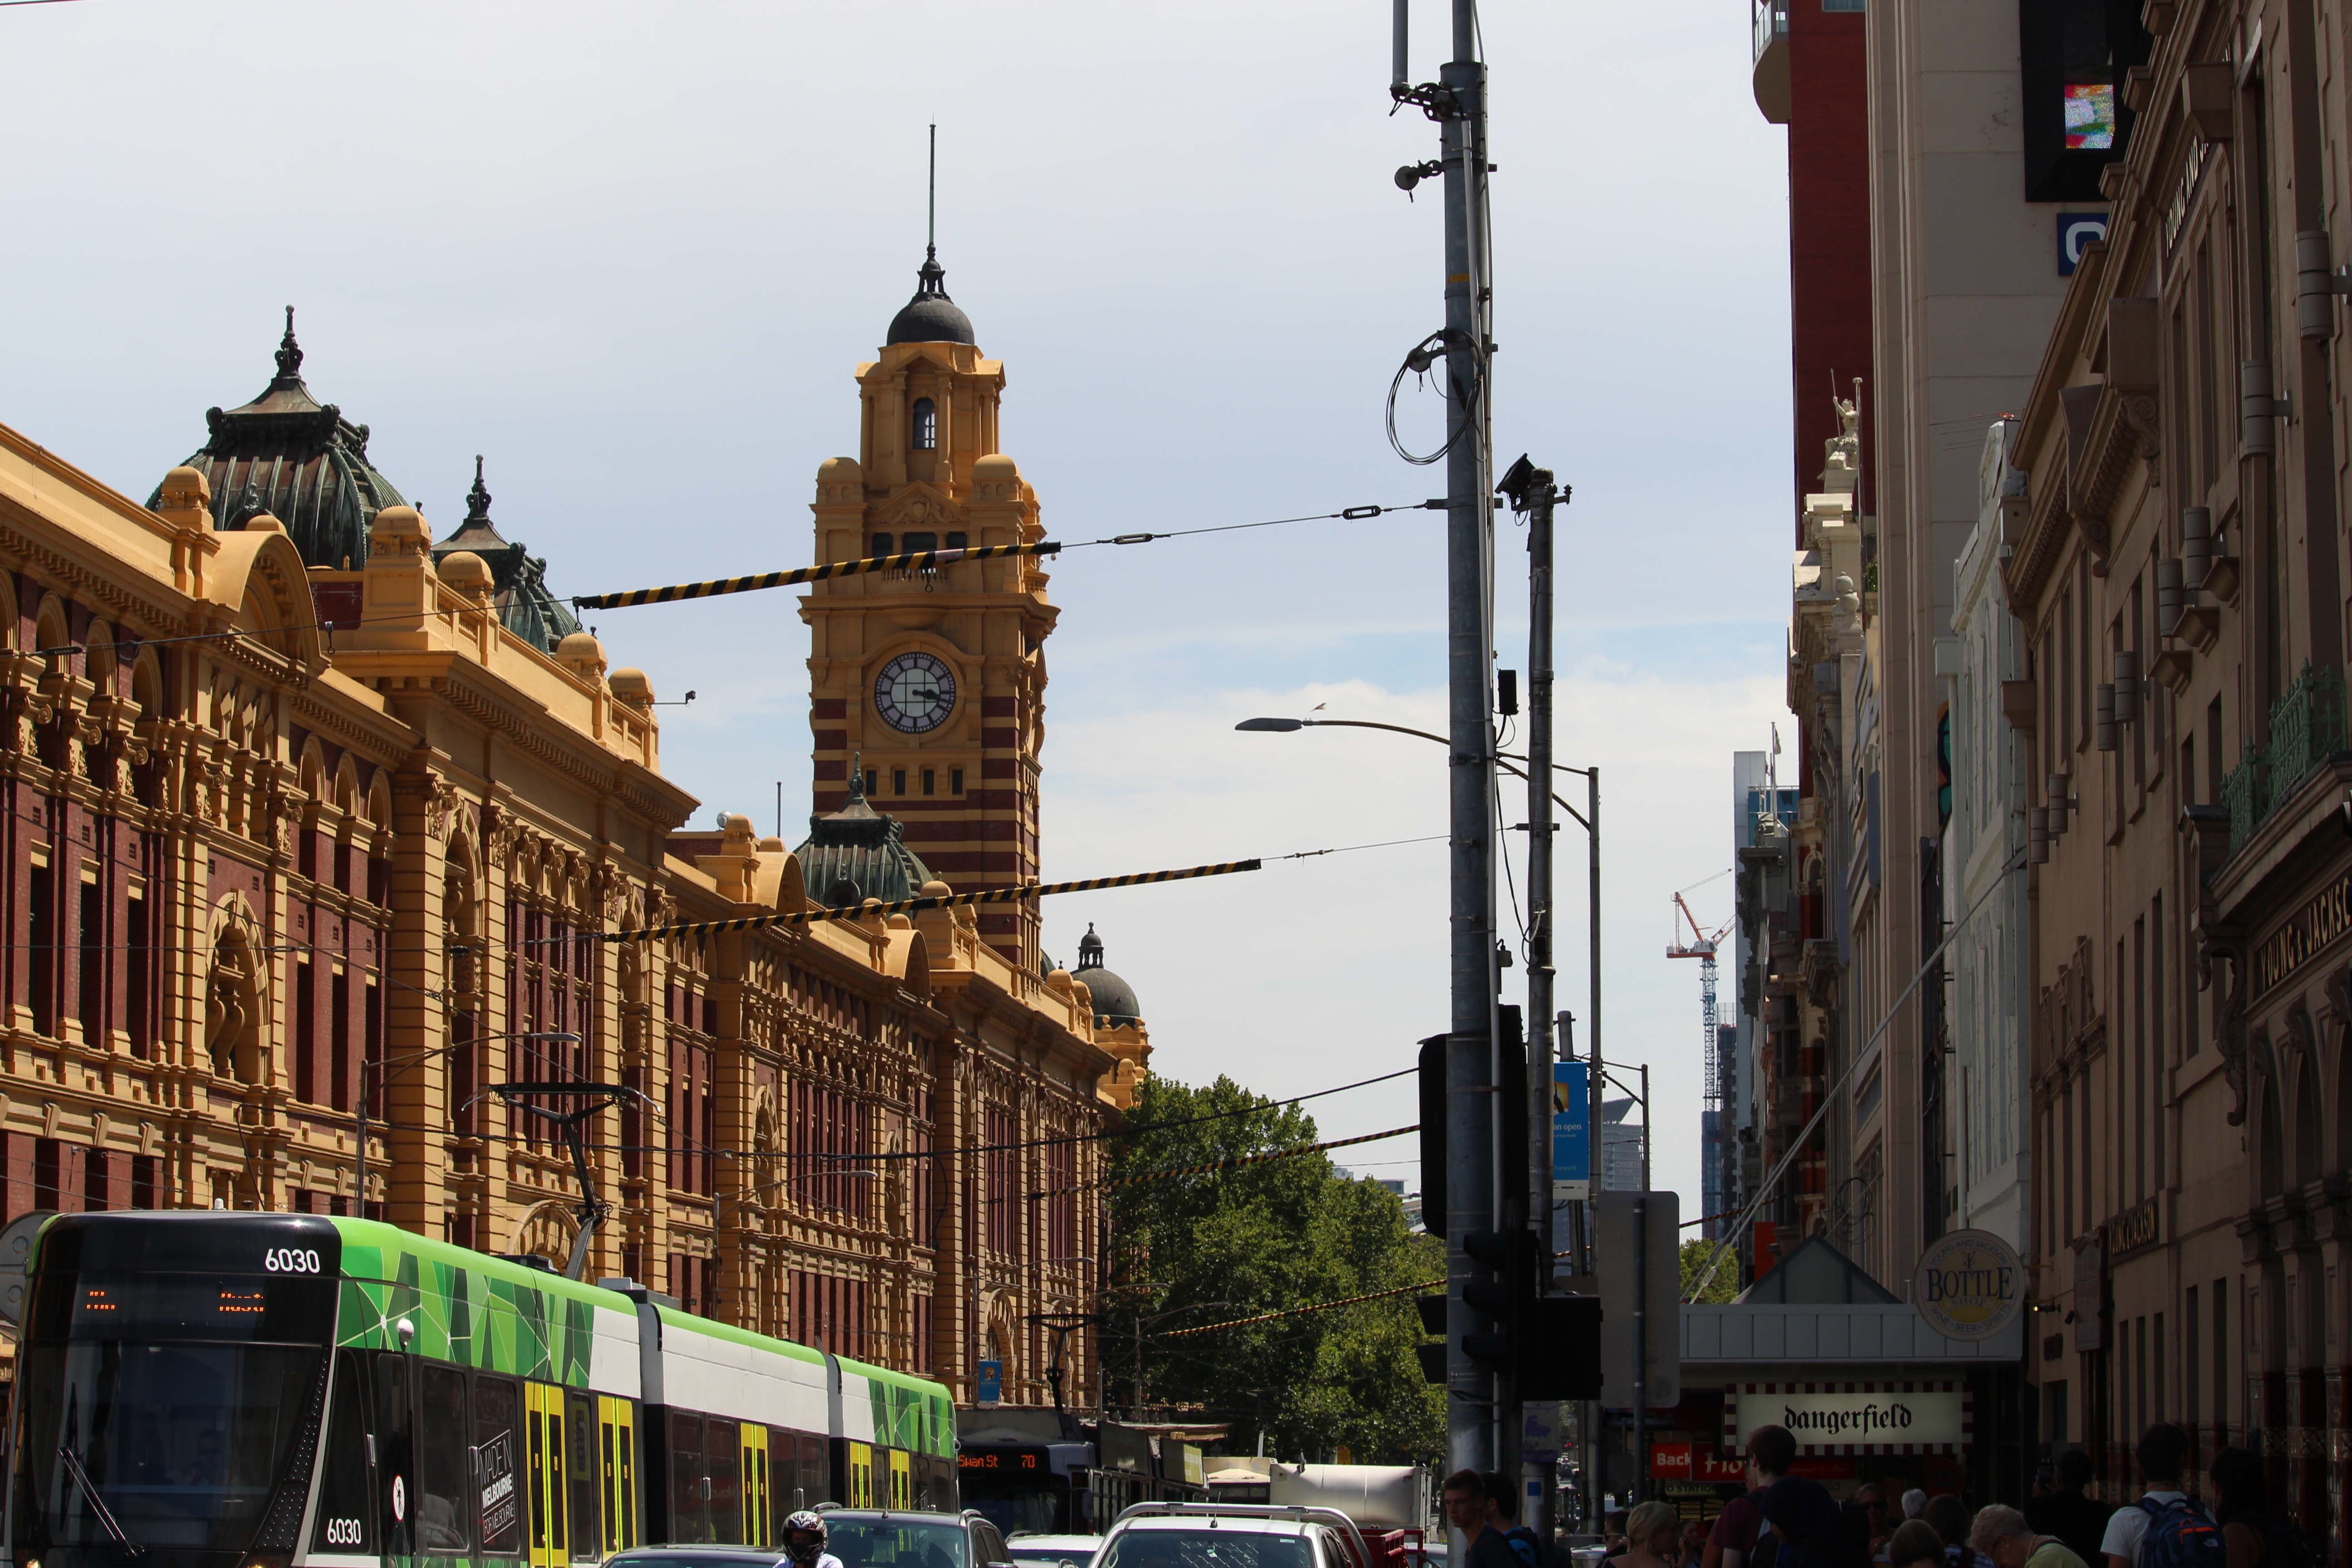 Melbourne - Article 1